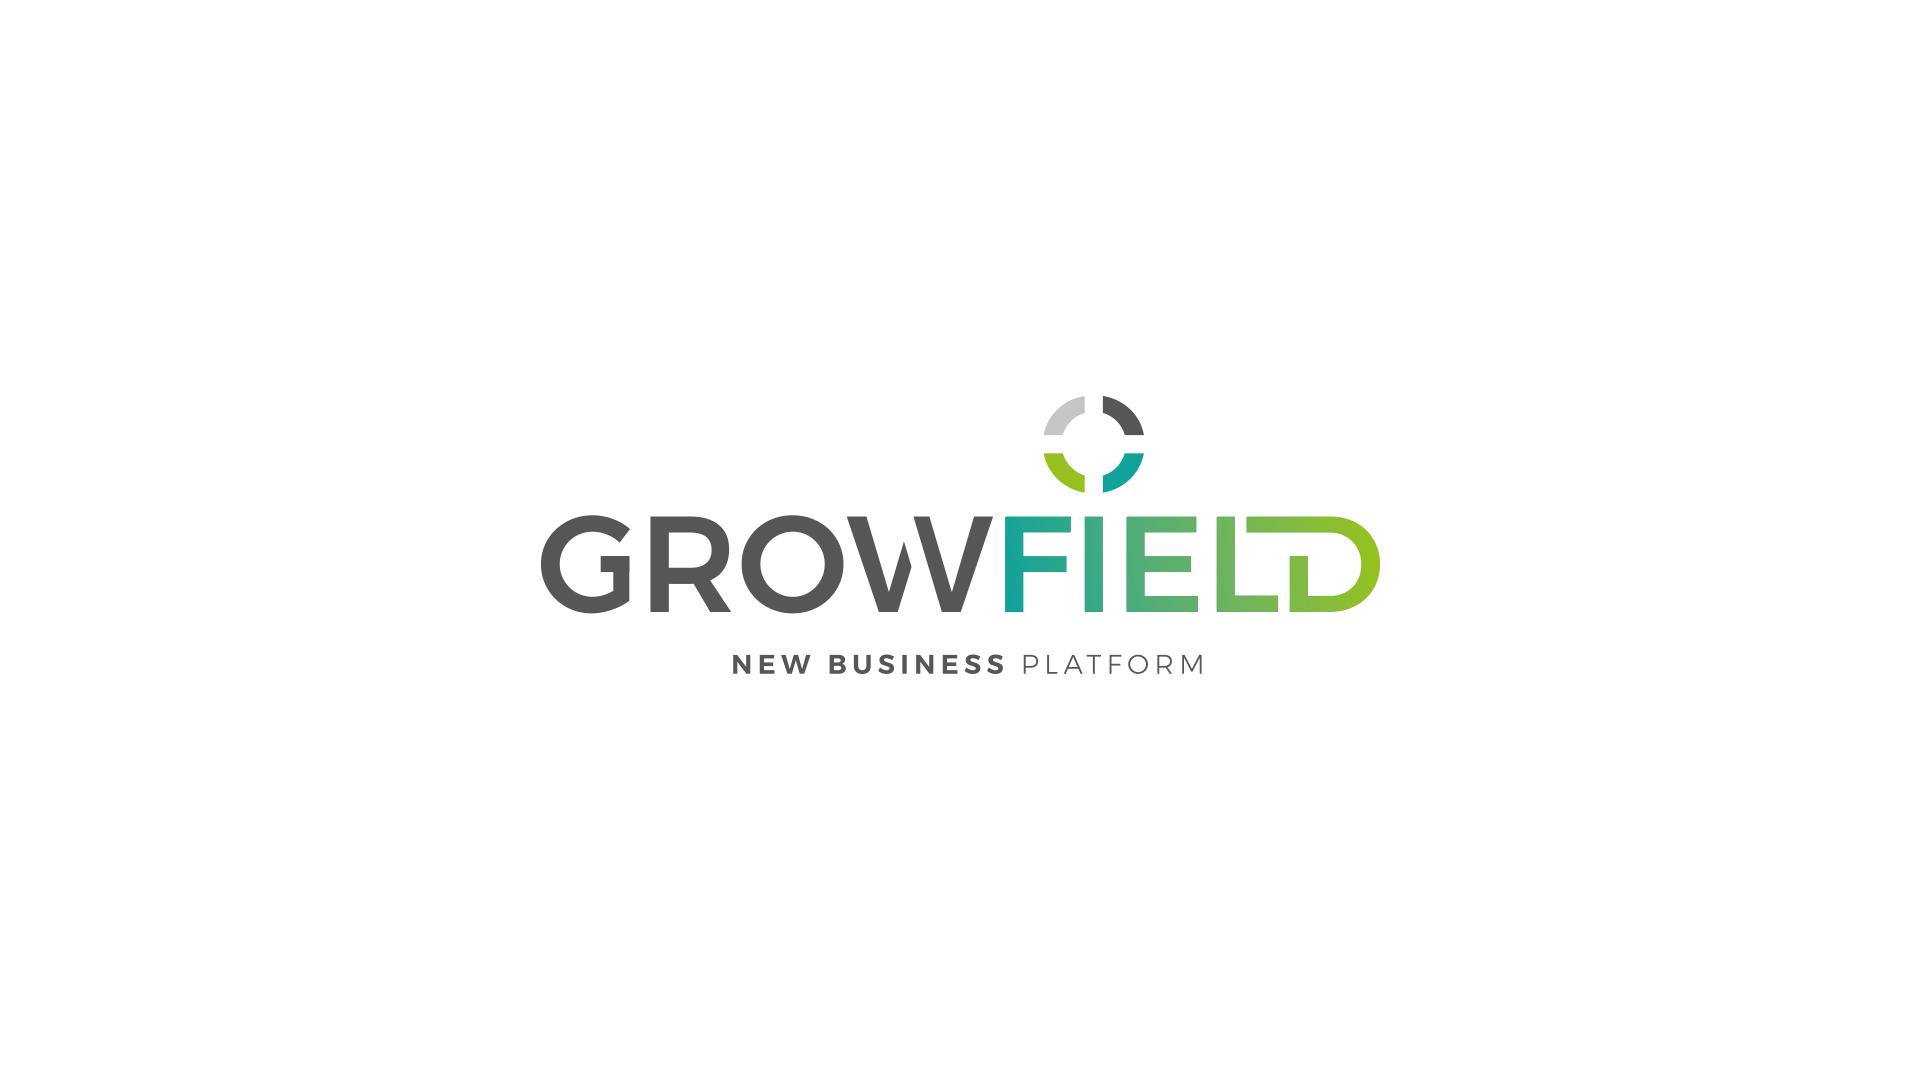 growfield